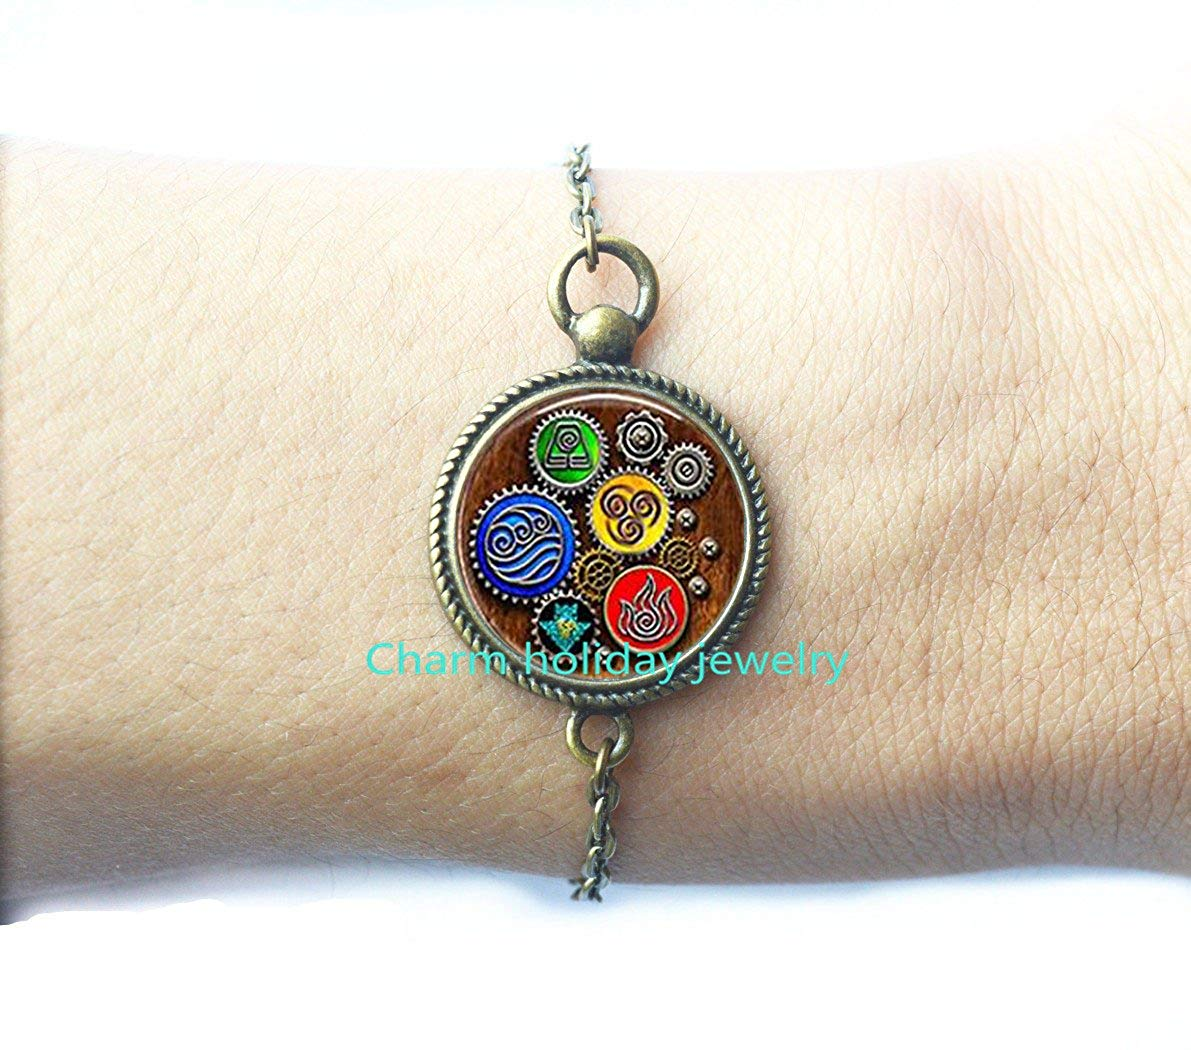 DiamondJewelryNY Eye Hook Bangle Bracelet with a Guardian Angel Charm.